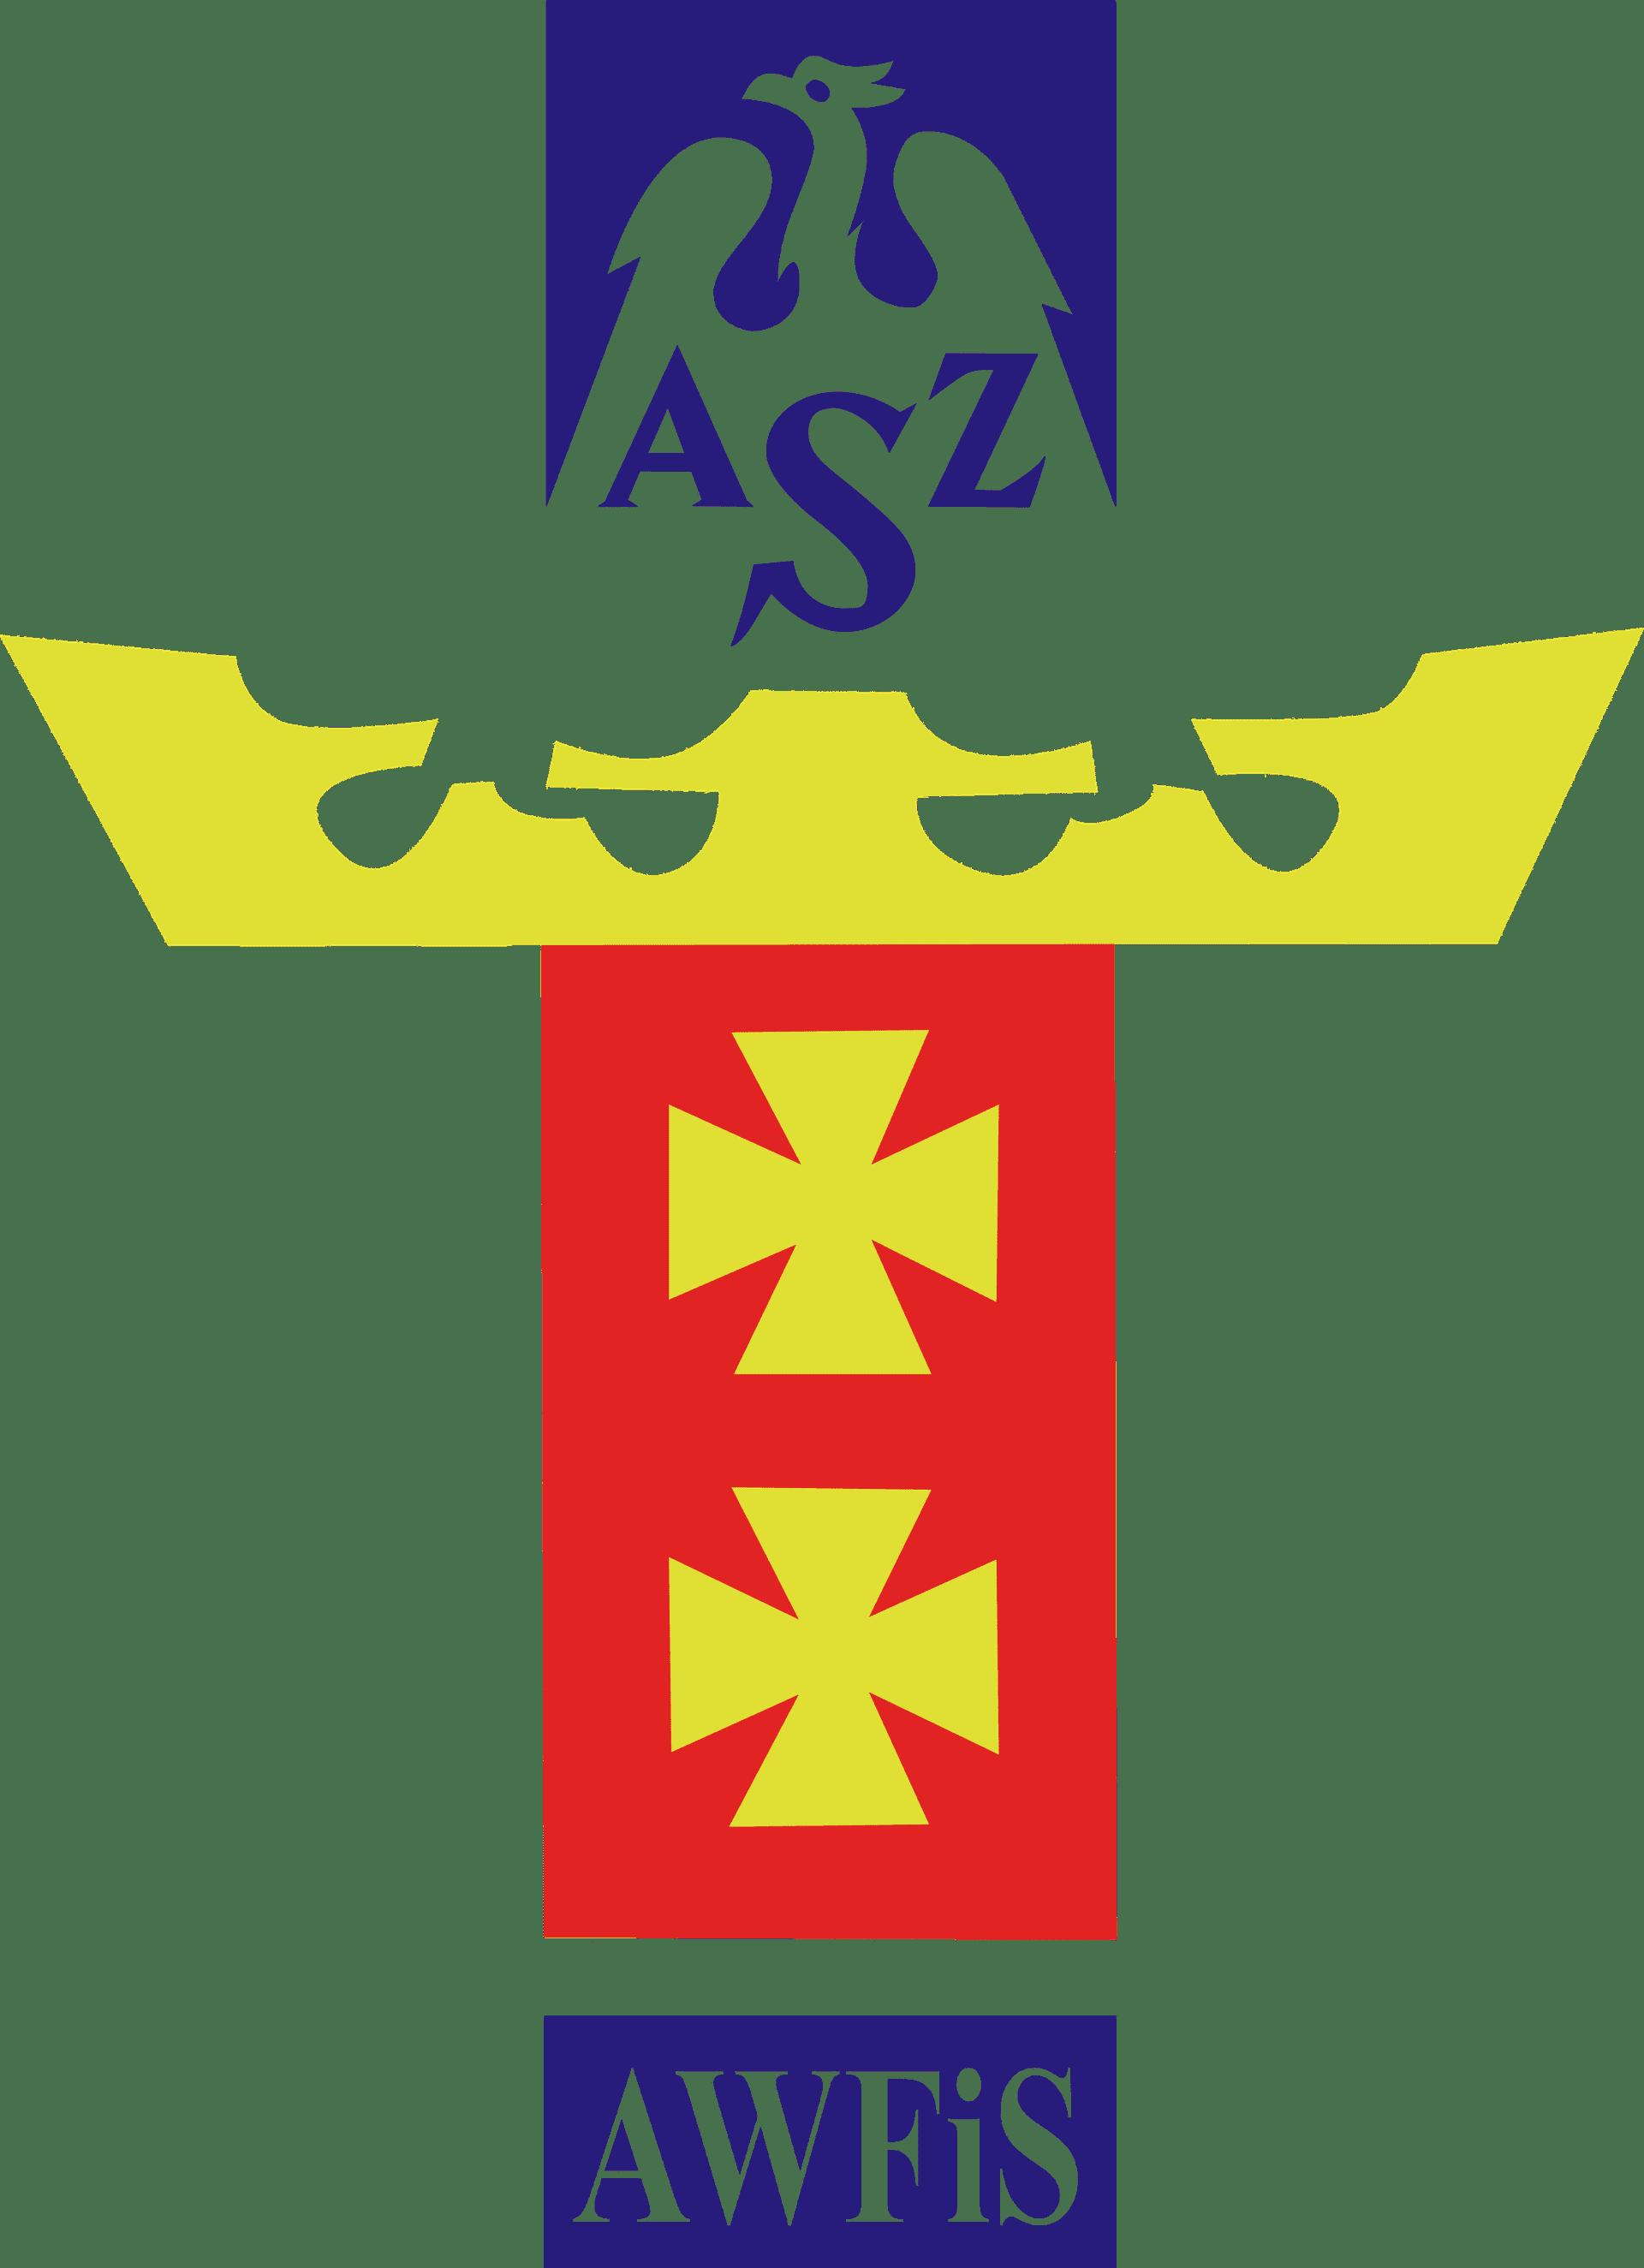 https://azsawfis.pl/